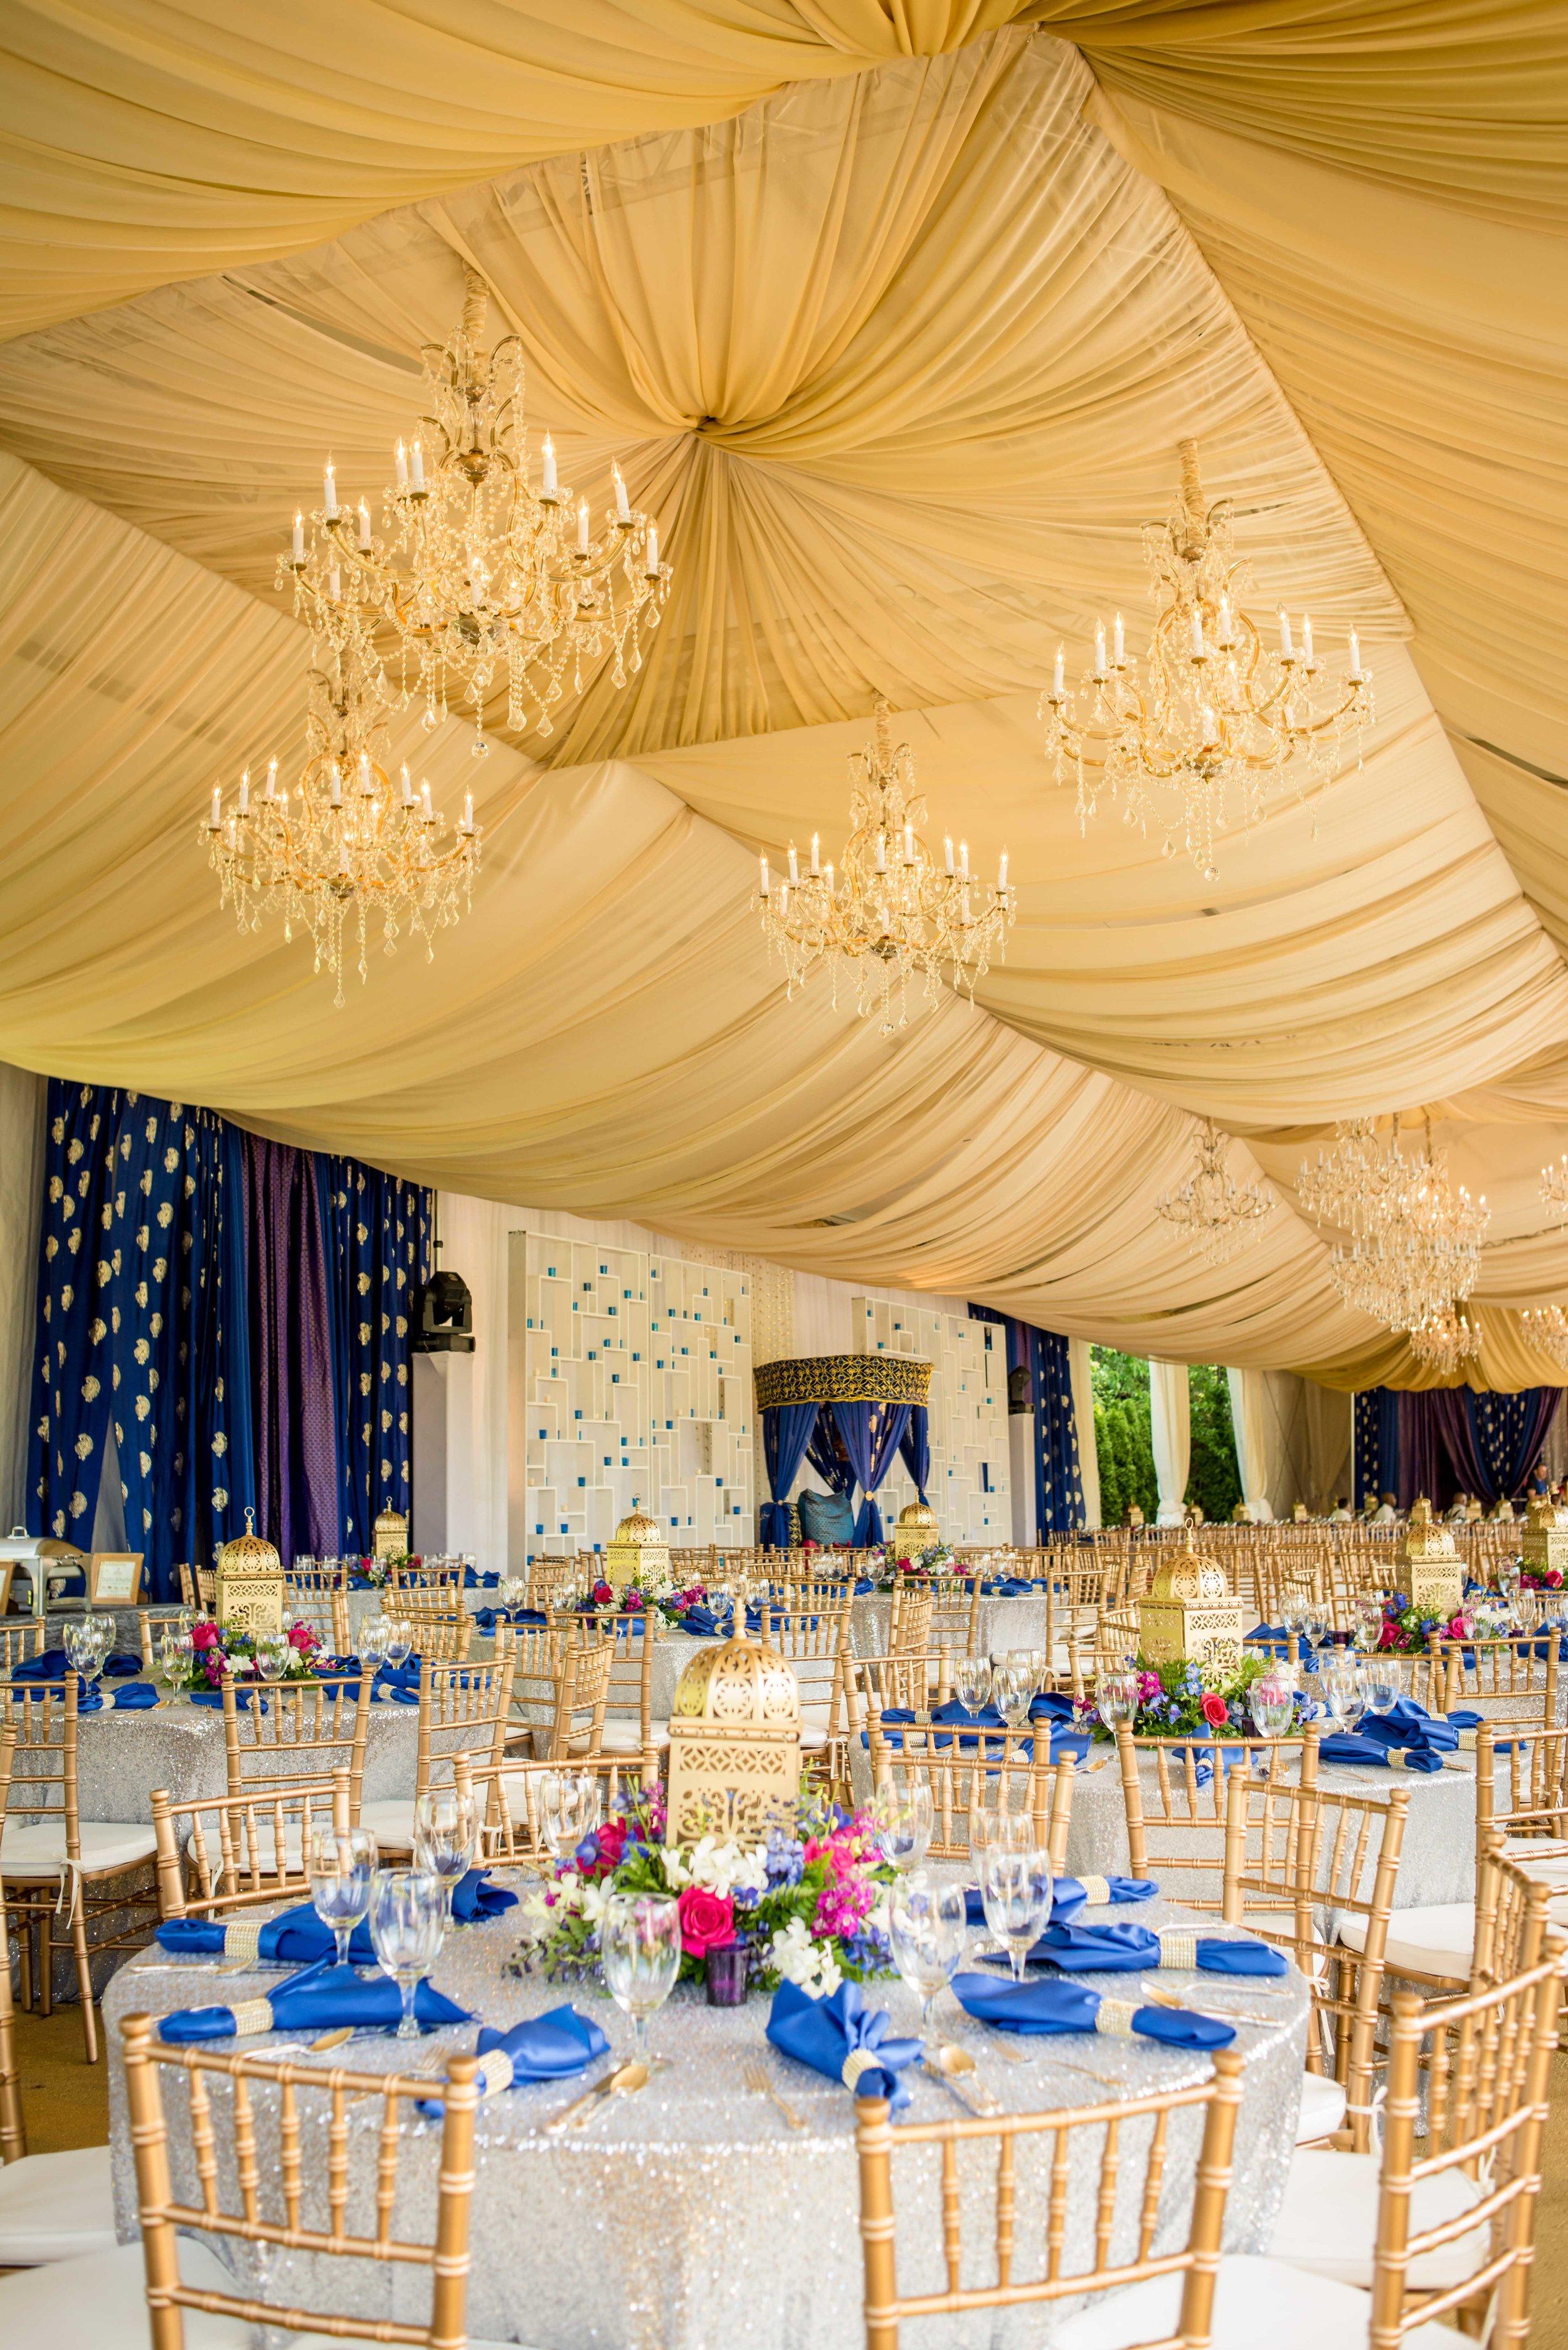 louisville-weddings-purvi-jignesh-02.jpg